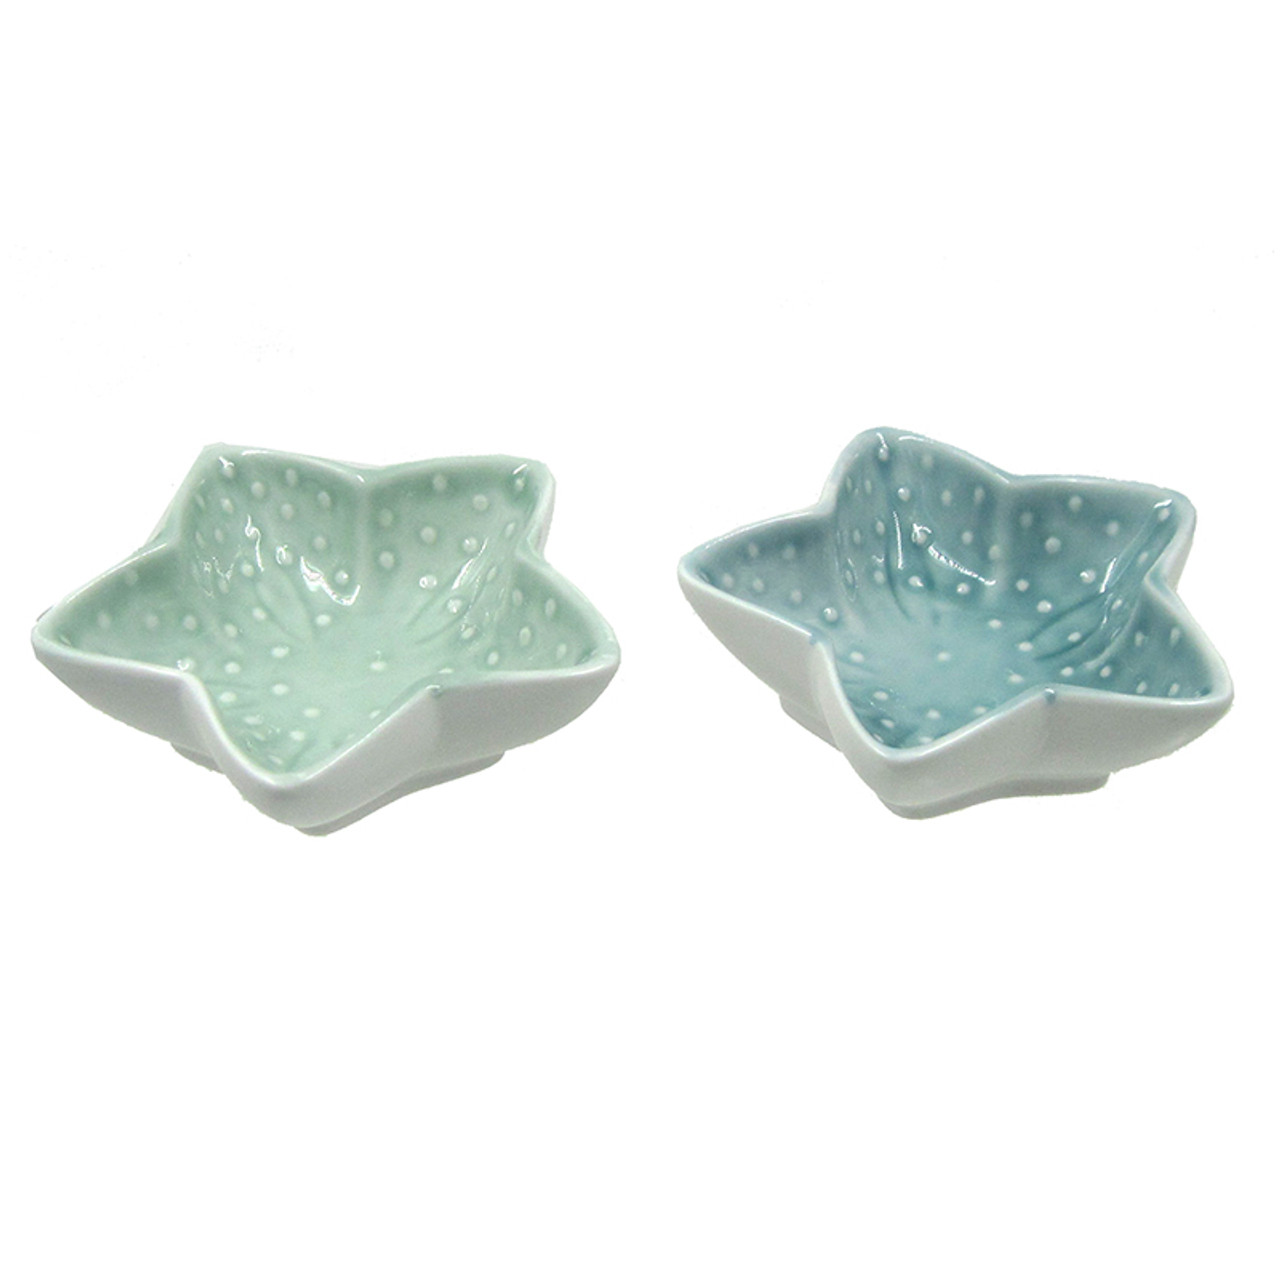 Ceramic Starfish Bowl Coastal Appetizer Dish Nautical Kitchen Decor California Seashell Company